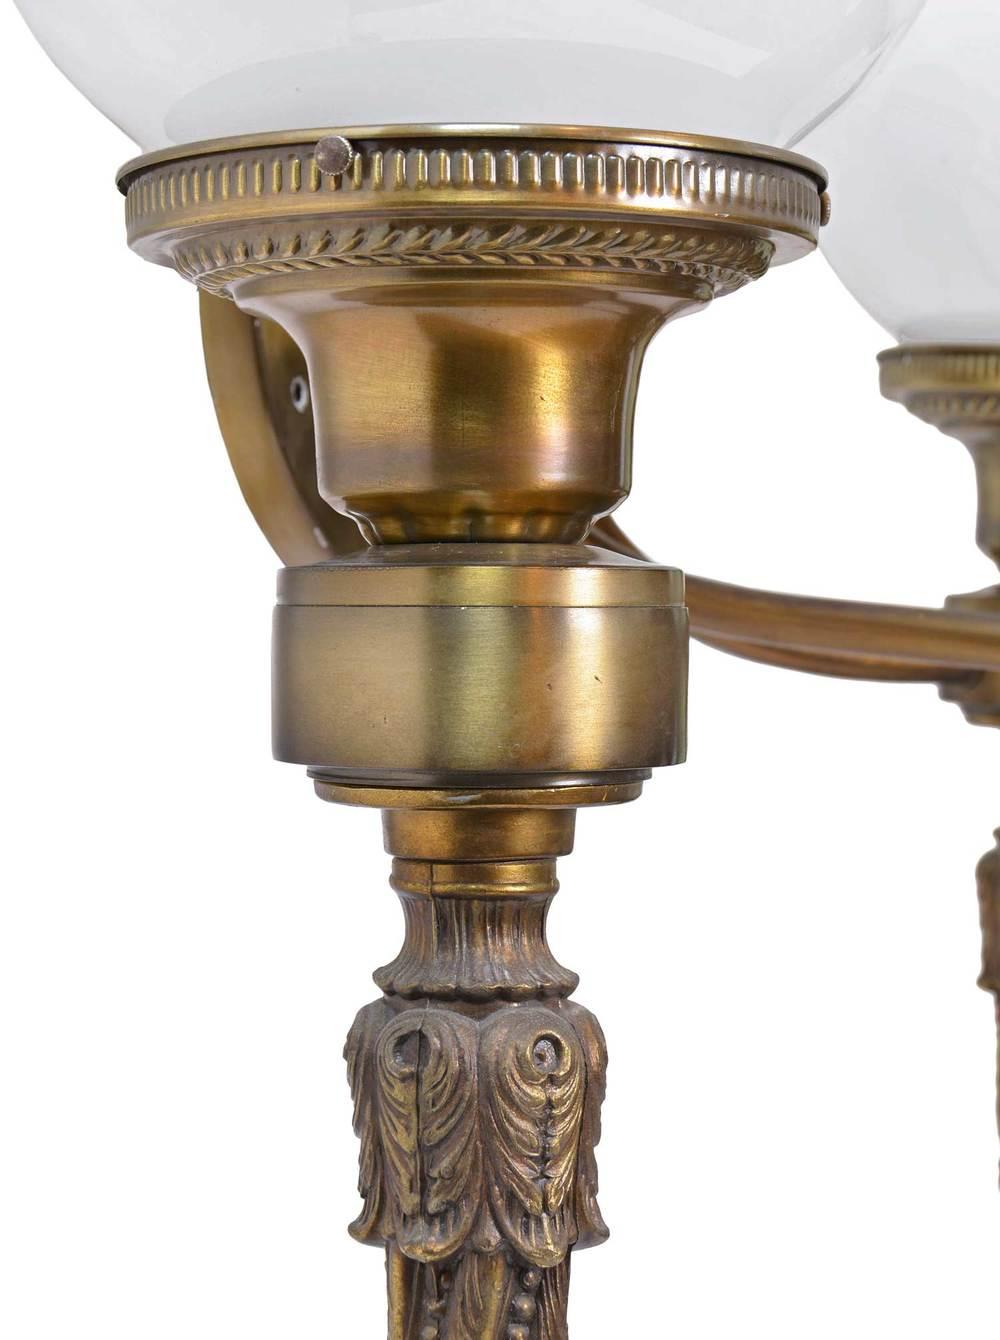 46140-brass-3-arm-sconce-detail.jpg